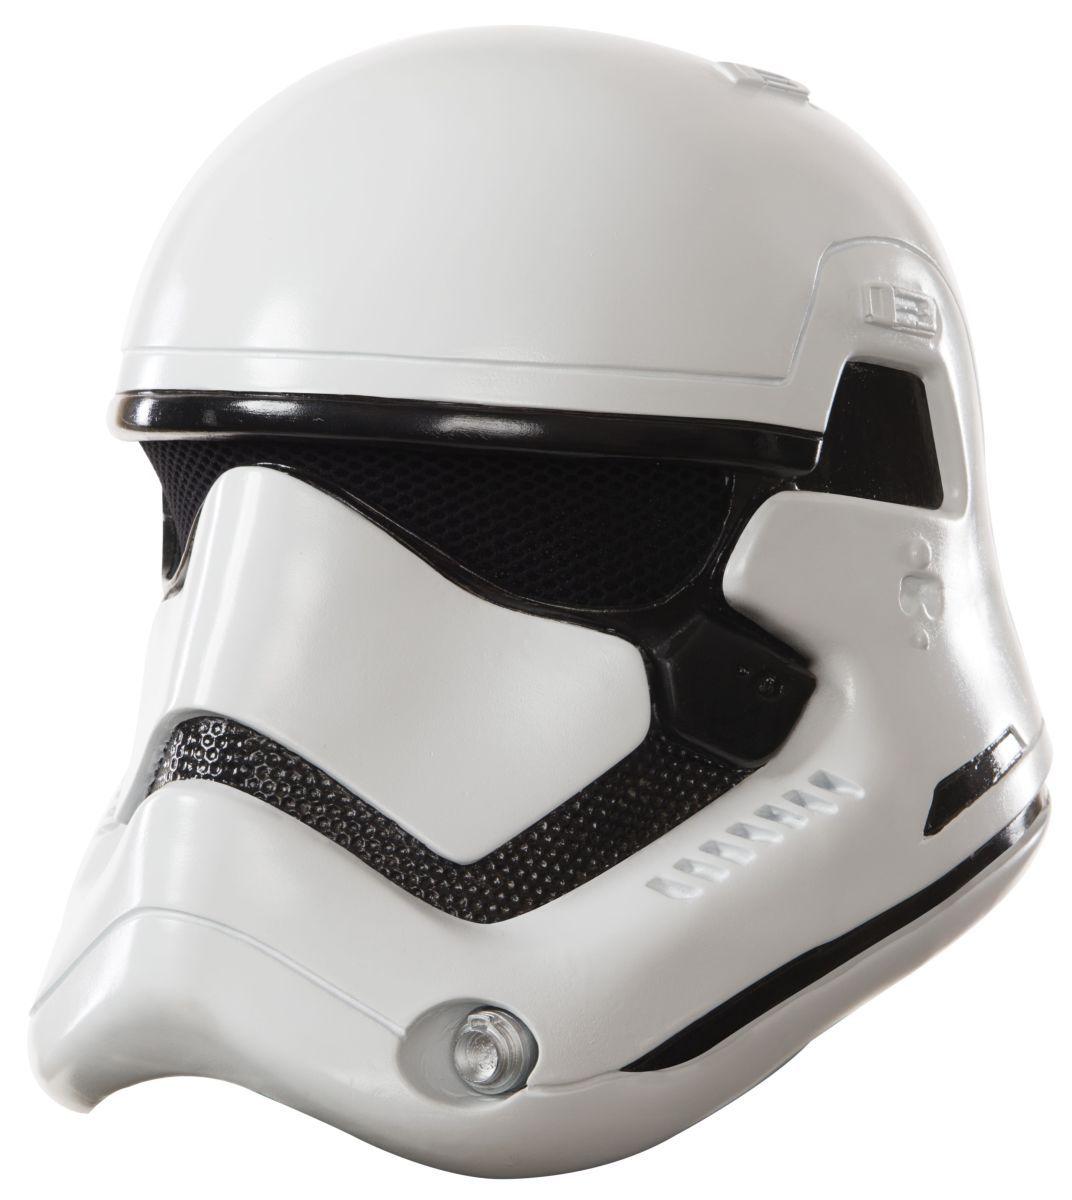 Capacete Stormtrooper (Deluxe  Edition): Star Wars O Despertar Da Força - Rubies Costumes - CD